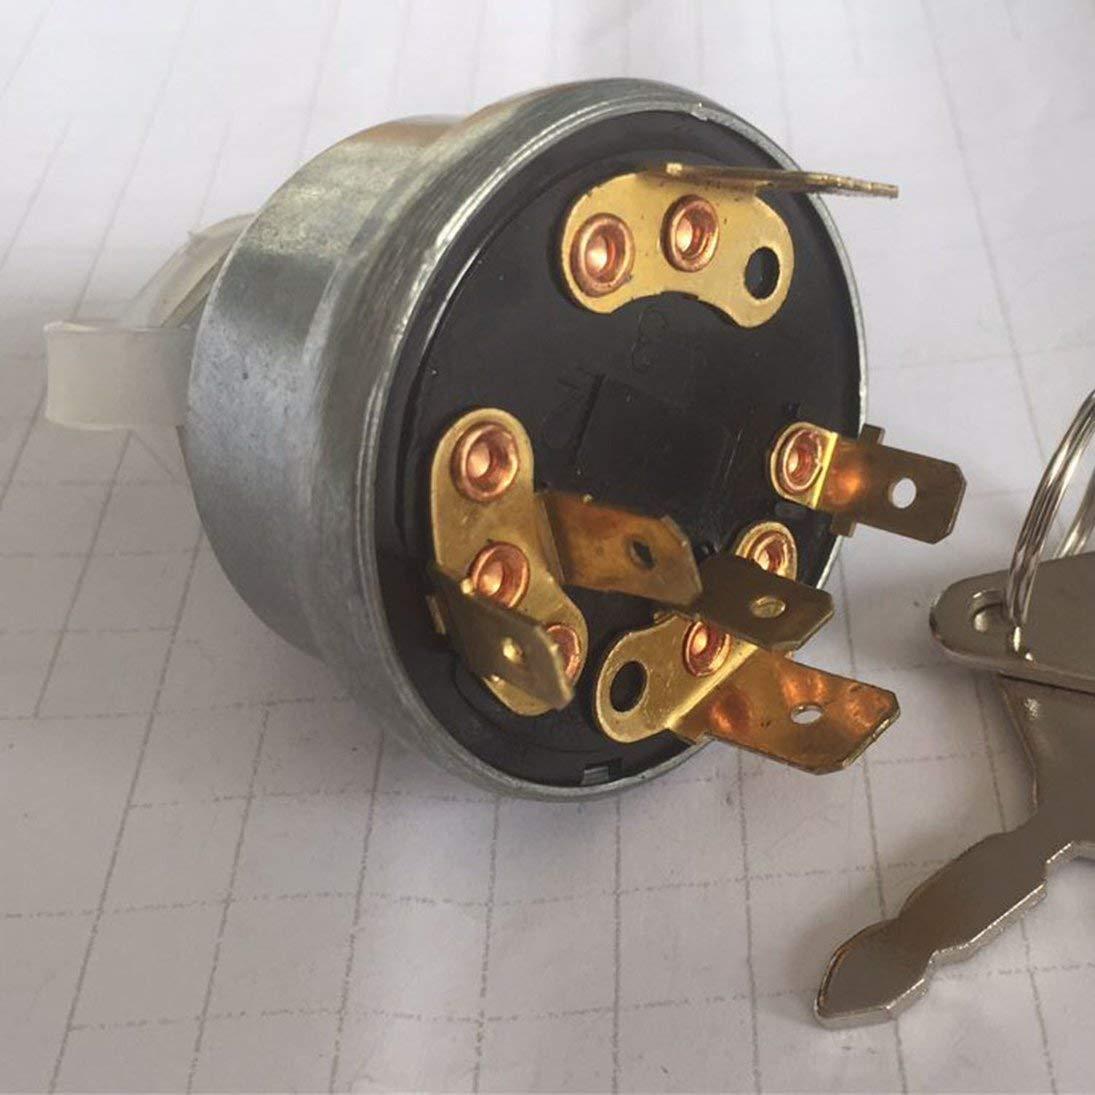 Interruptor de encendido del tractor Digger Start para Massey Ferguson John con 2 llaves